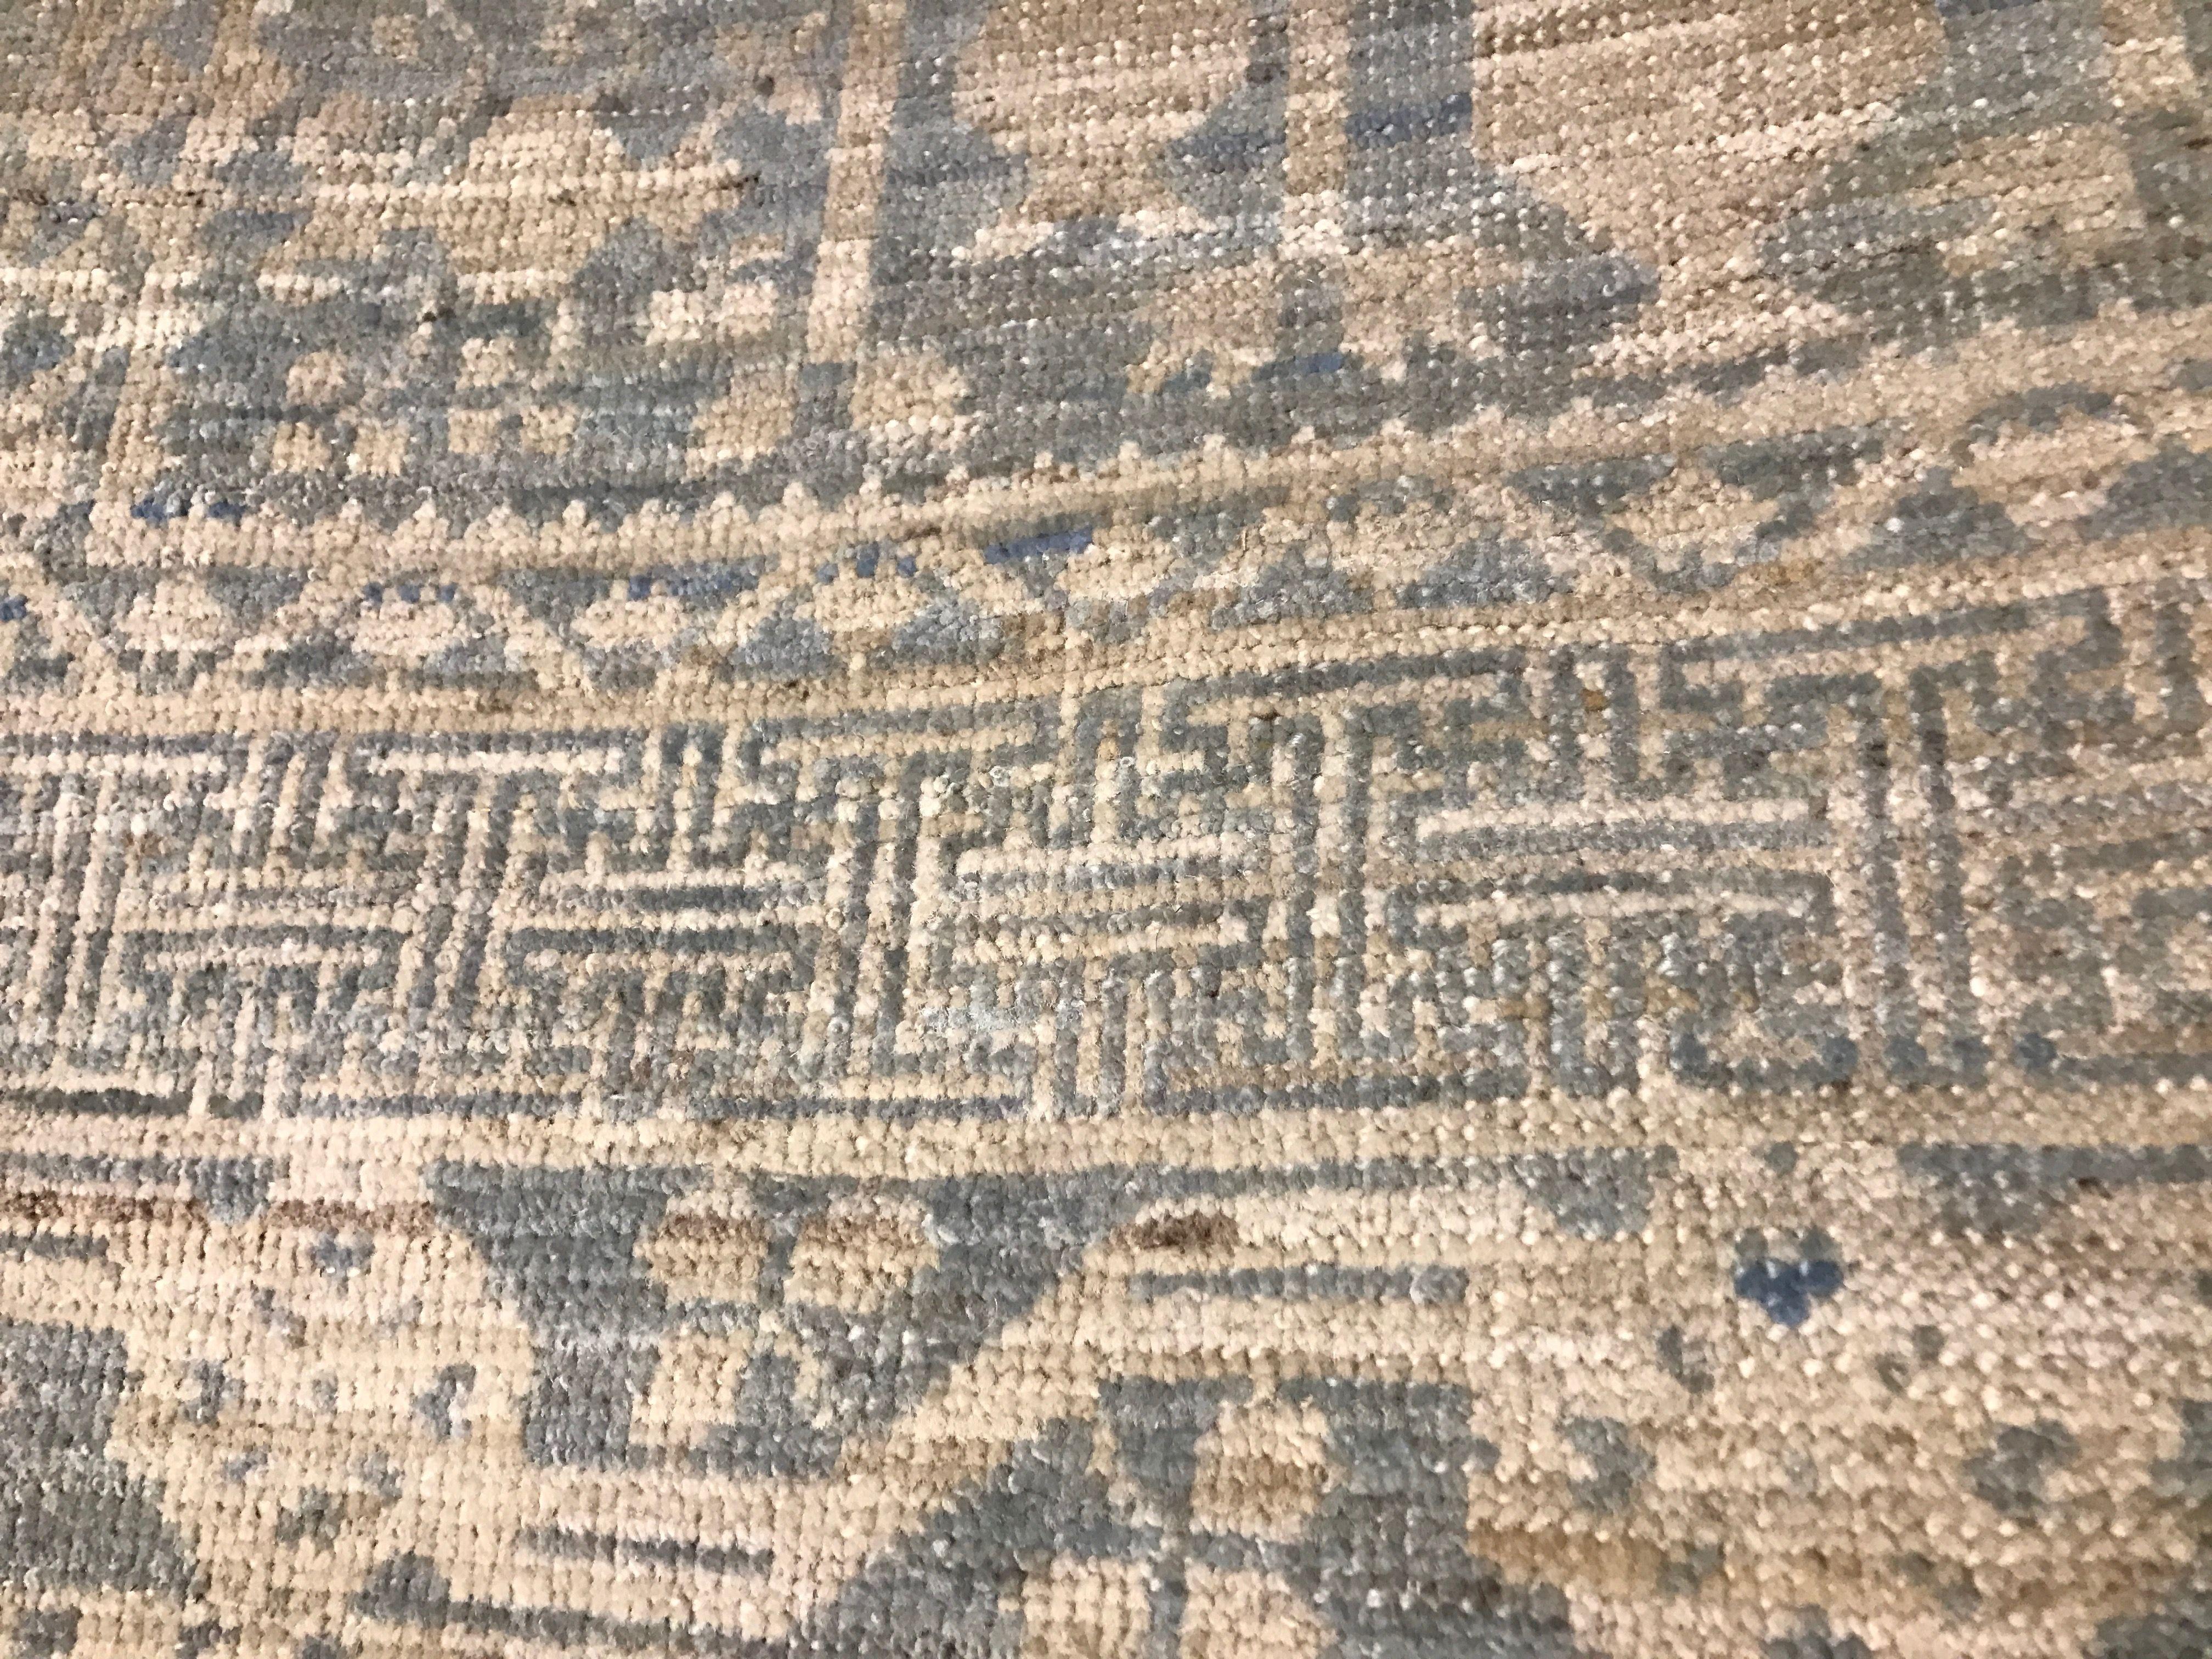 Possible foyer rug close up joiner goshawk ranch pinterest foyers